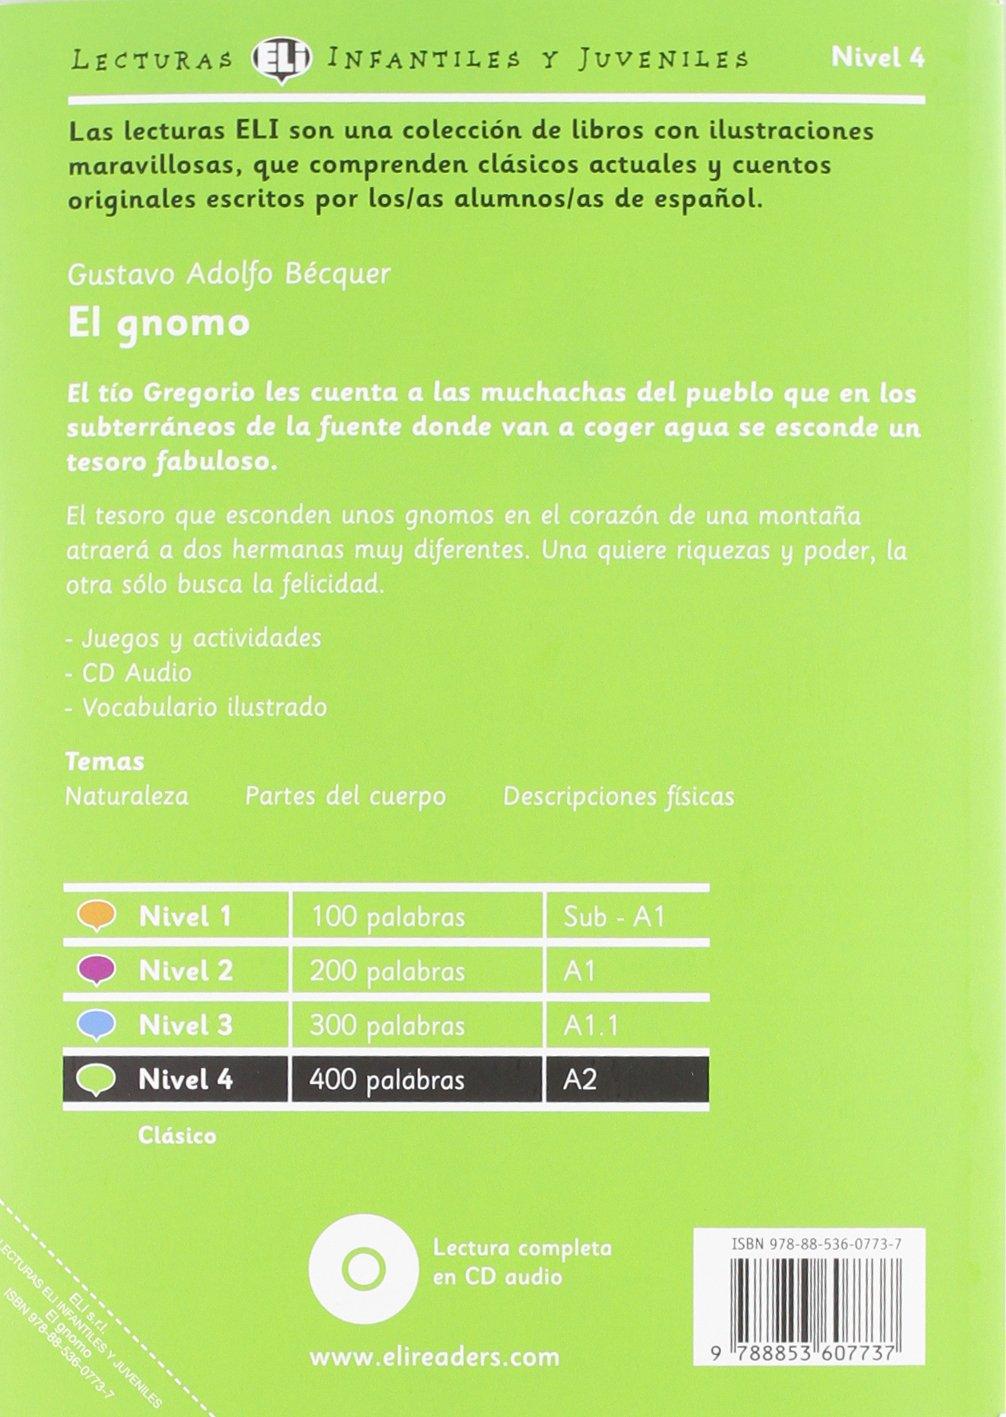 El gnomo + CD: Andrea Rivola, Gustavo Adolfo Becquer: 9788853607737: Amazon.com: Books